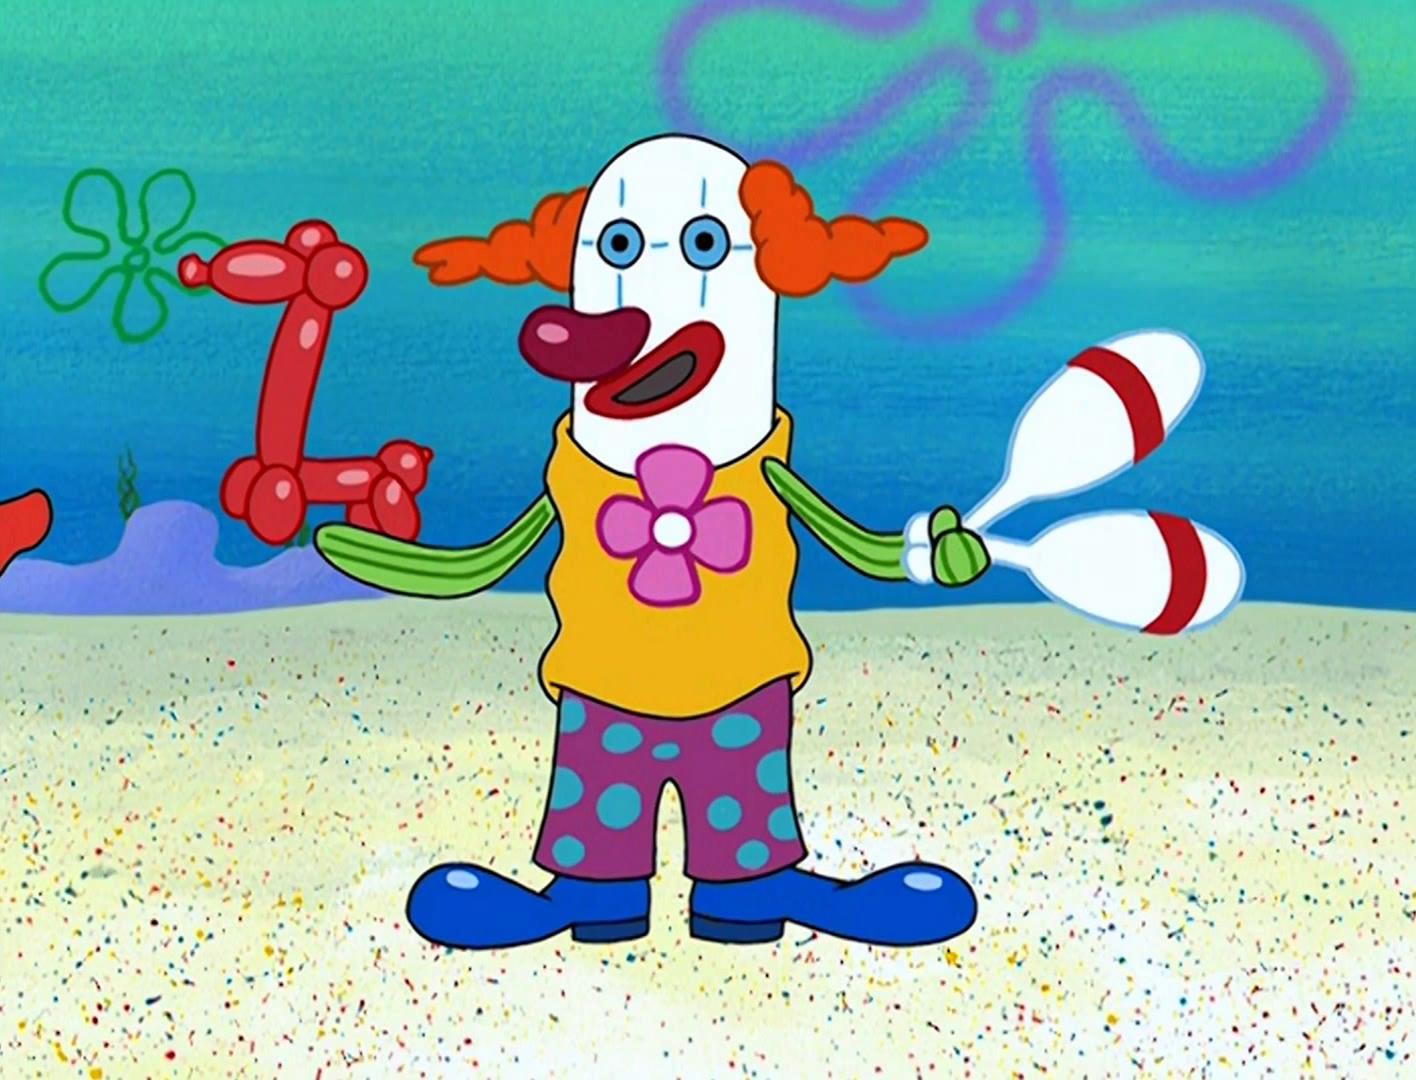 Clown/gallery